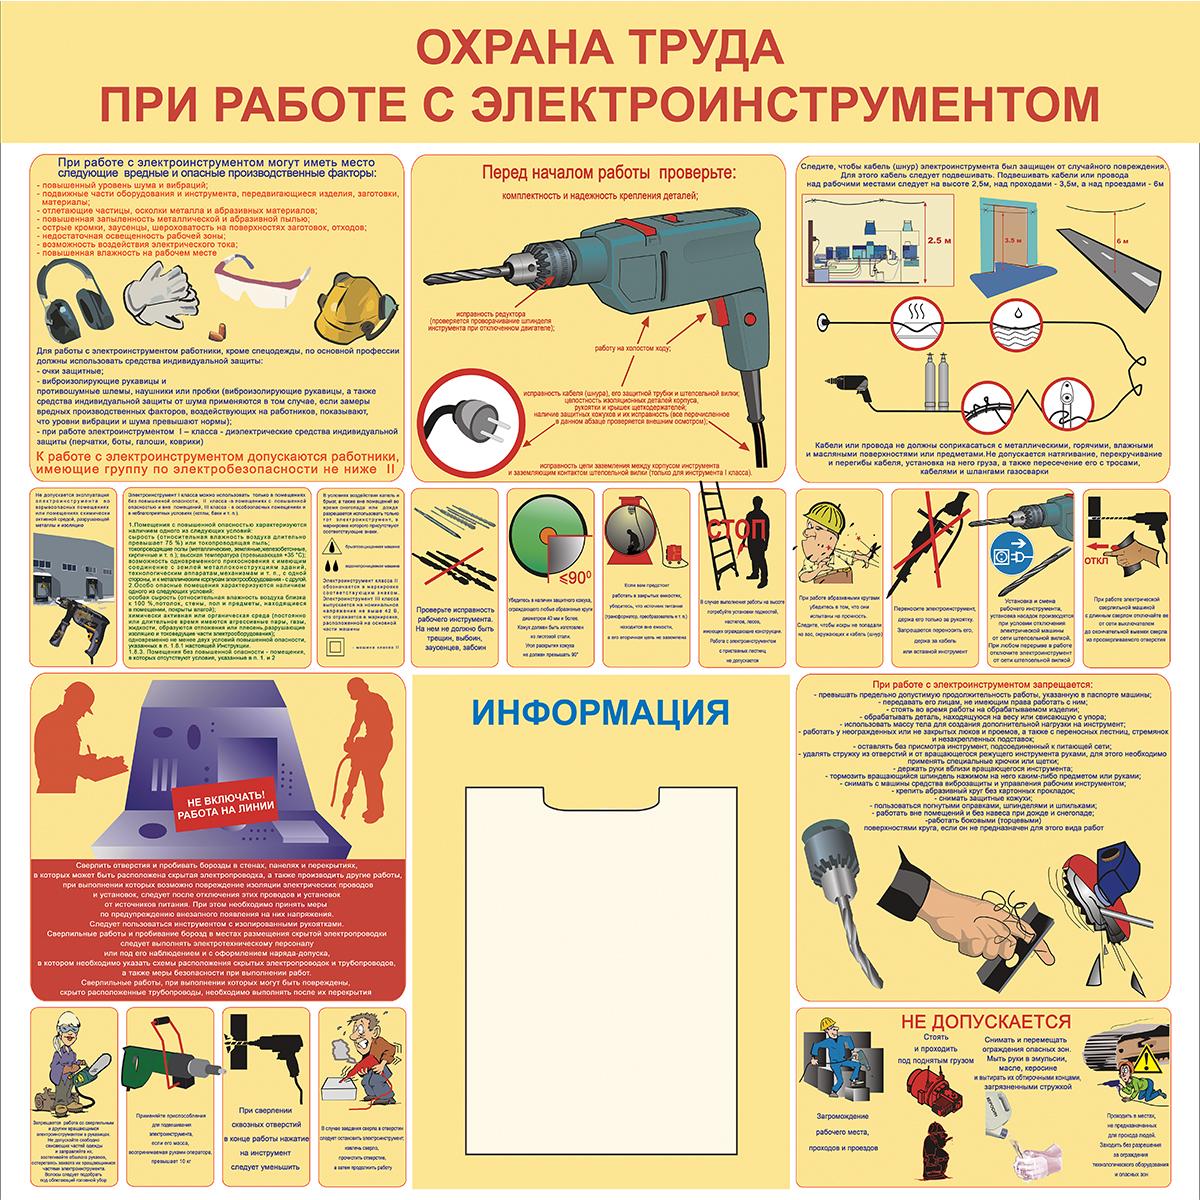 плакат Охрана труда при работе с электроинструментом  1000х1000 мм,  1 карман А4